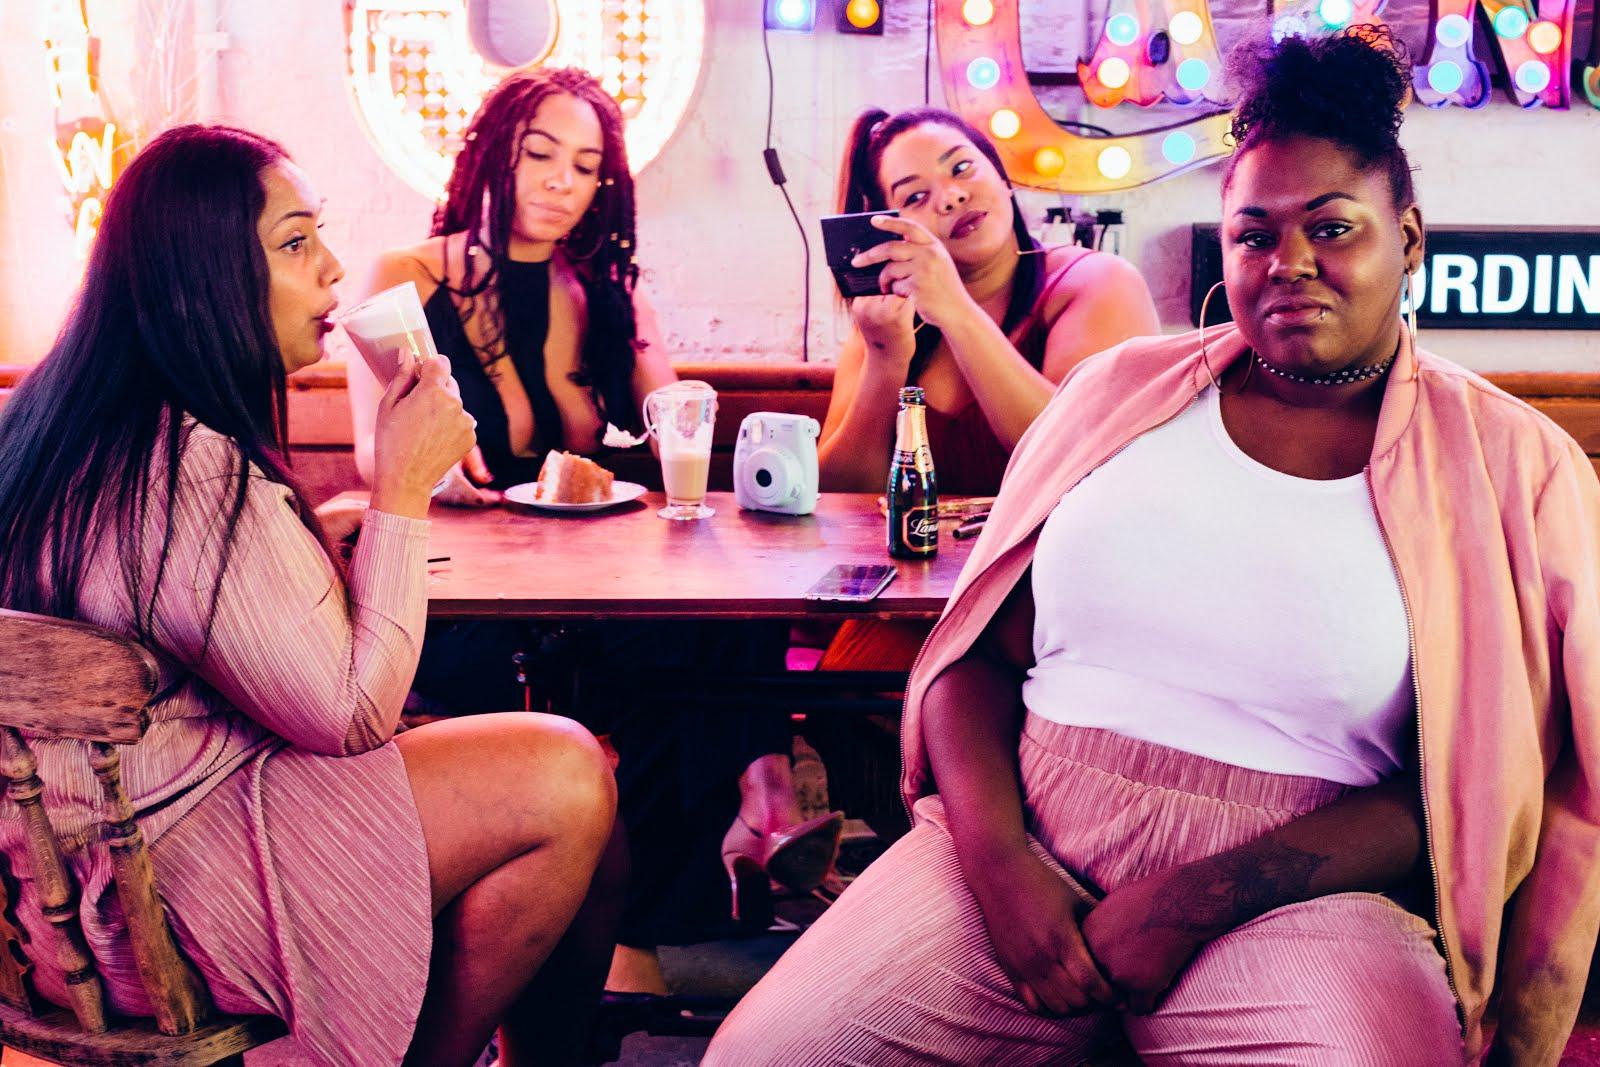 #ITSCosignedByGirls Editorial ft @inthestyleUK & @inthestylecurve